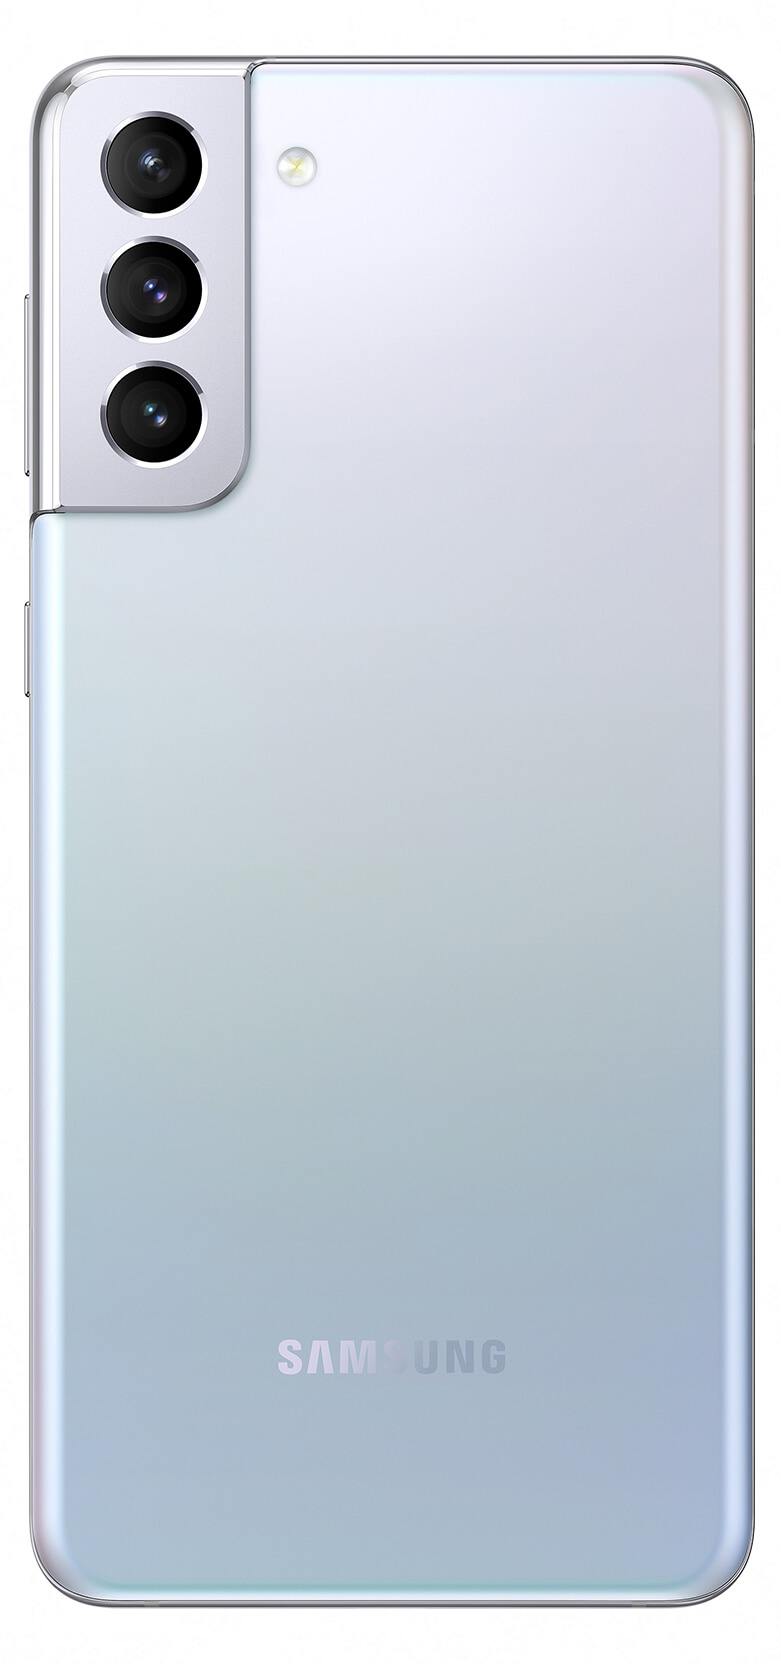 Samsung Galaxy S21 Plus 5G Phantom Silver 8GB RAM |256GB